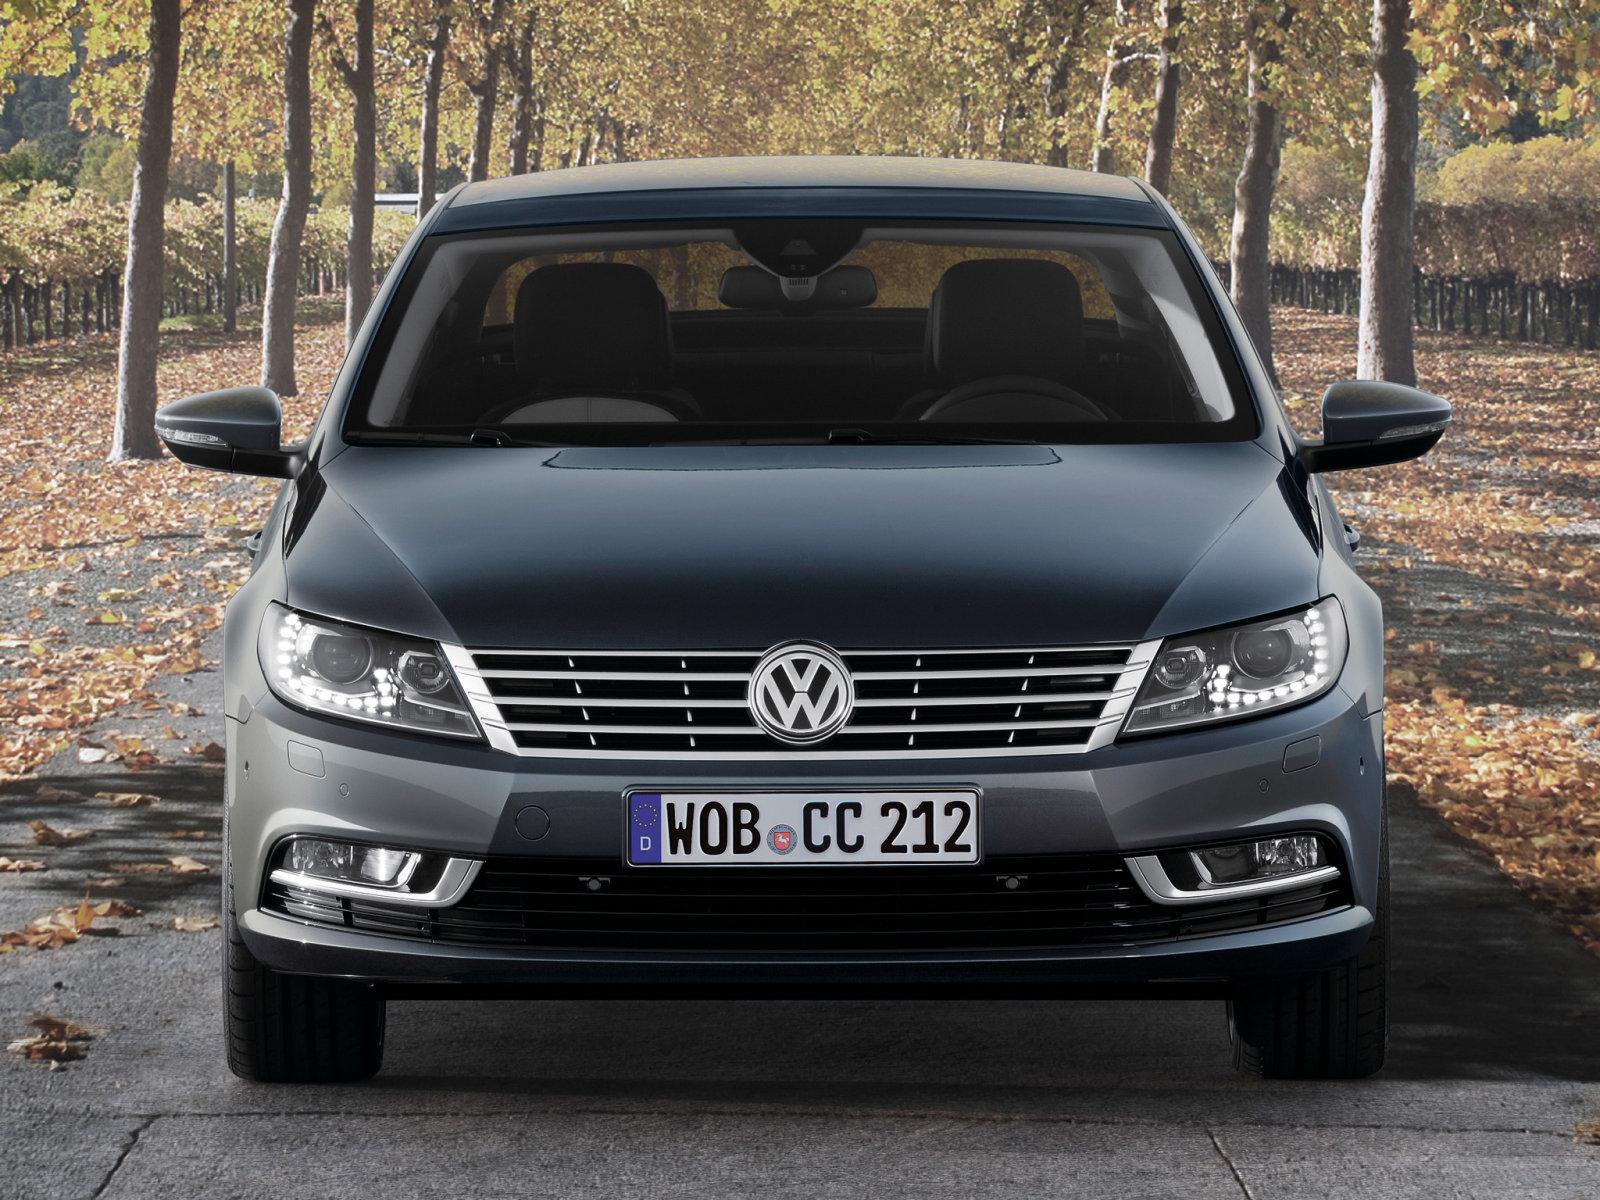 Volkswagen (Фольксваген) Passat CC 2012- г.